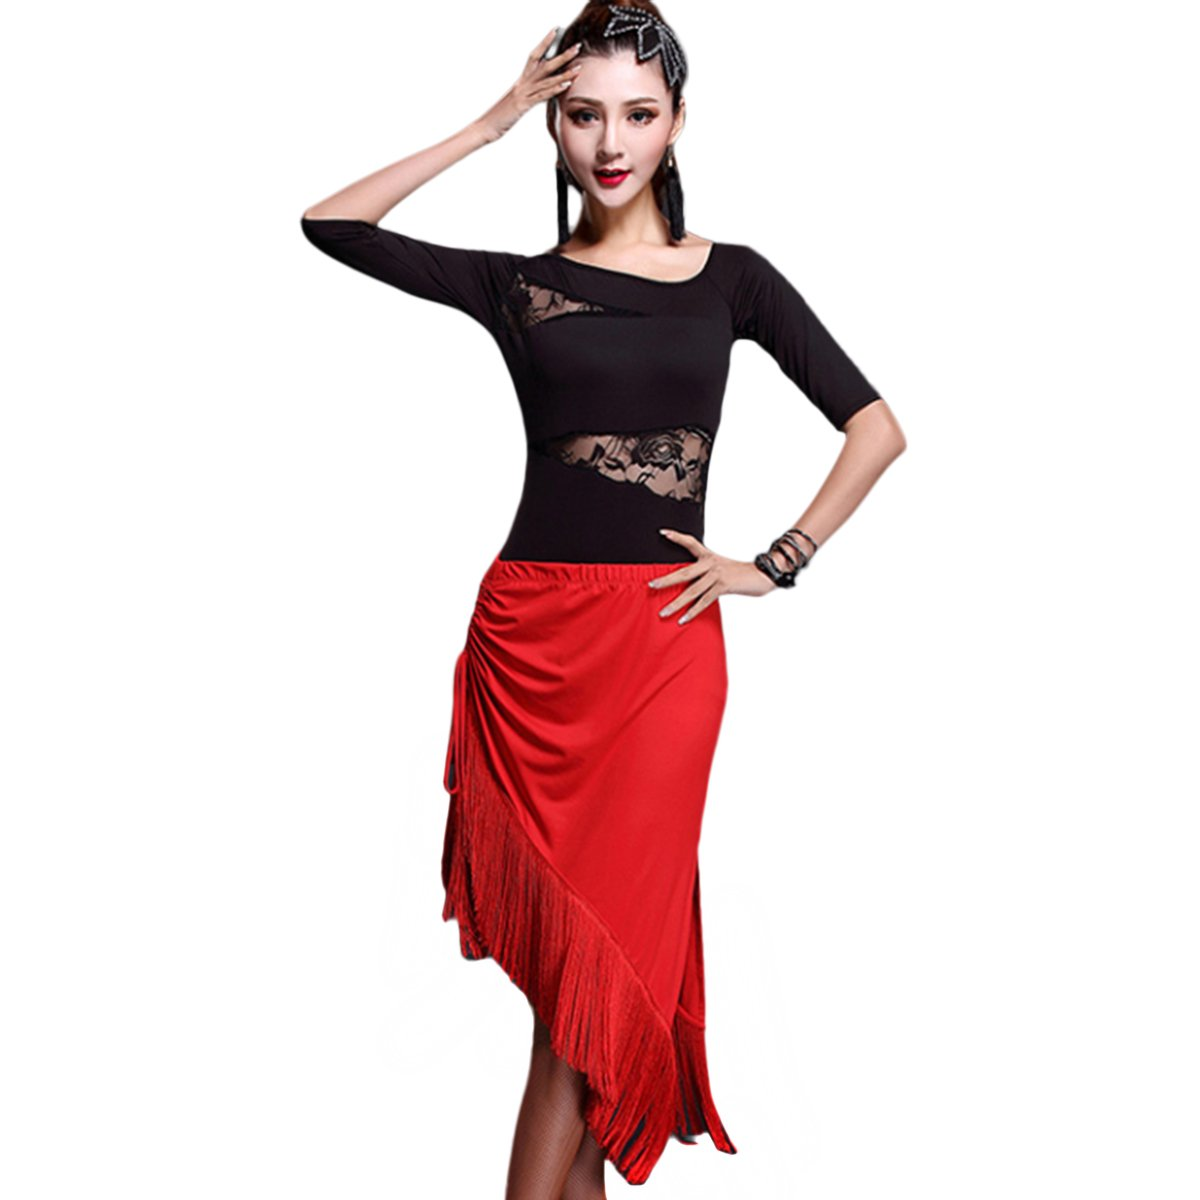 54844776b Galleon - Womens Latin Dance Dress Tassels Style Latin Dance Costume Adult  Dancing Practice Performance Skirt XL - Red